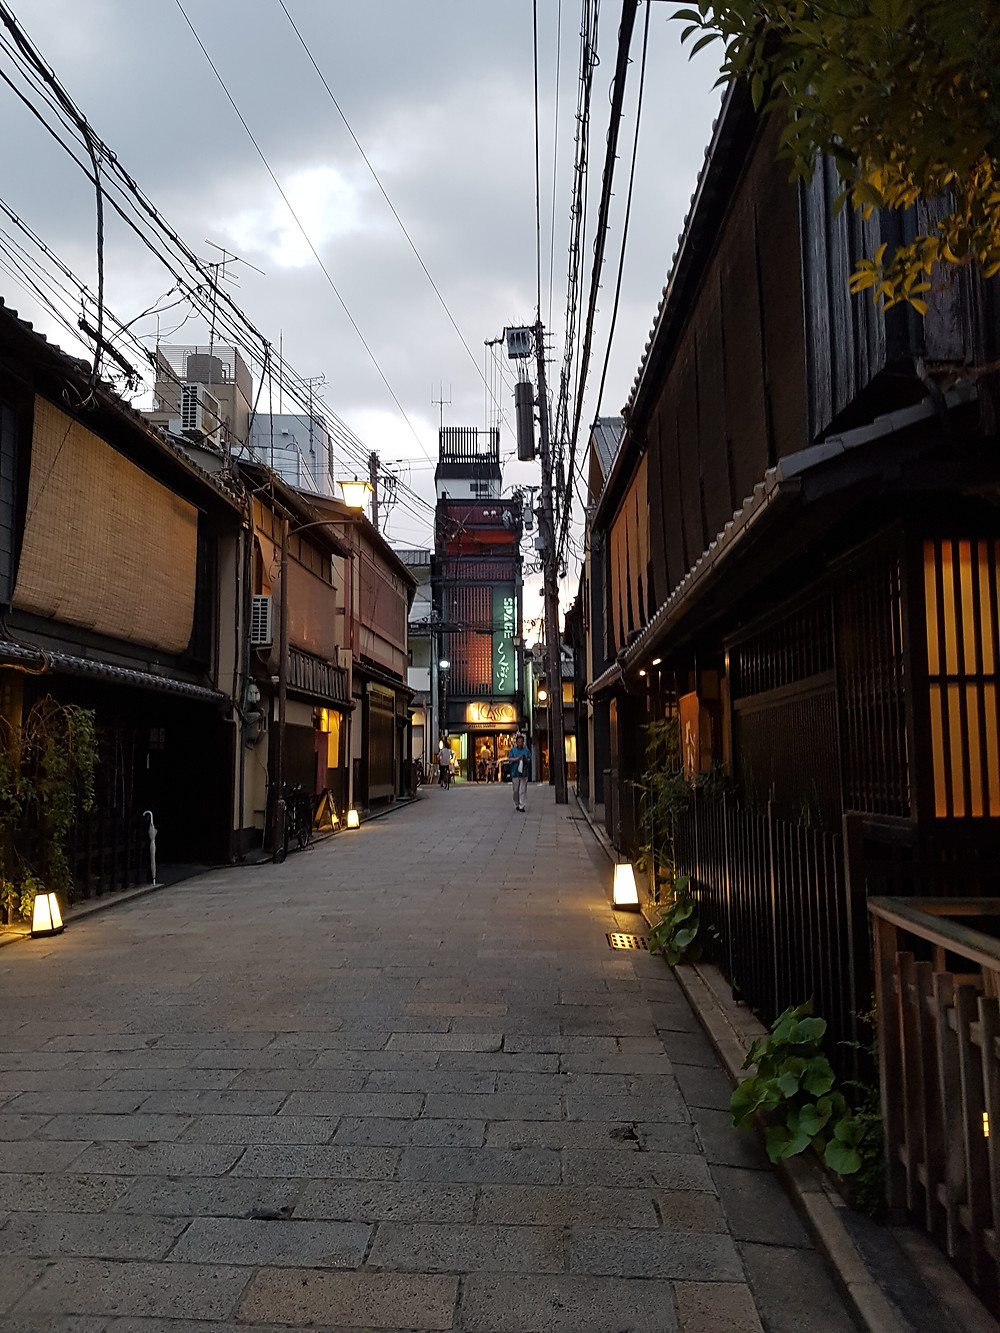 Händlerhäuser in Shirakawa